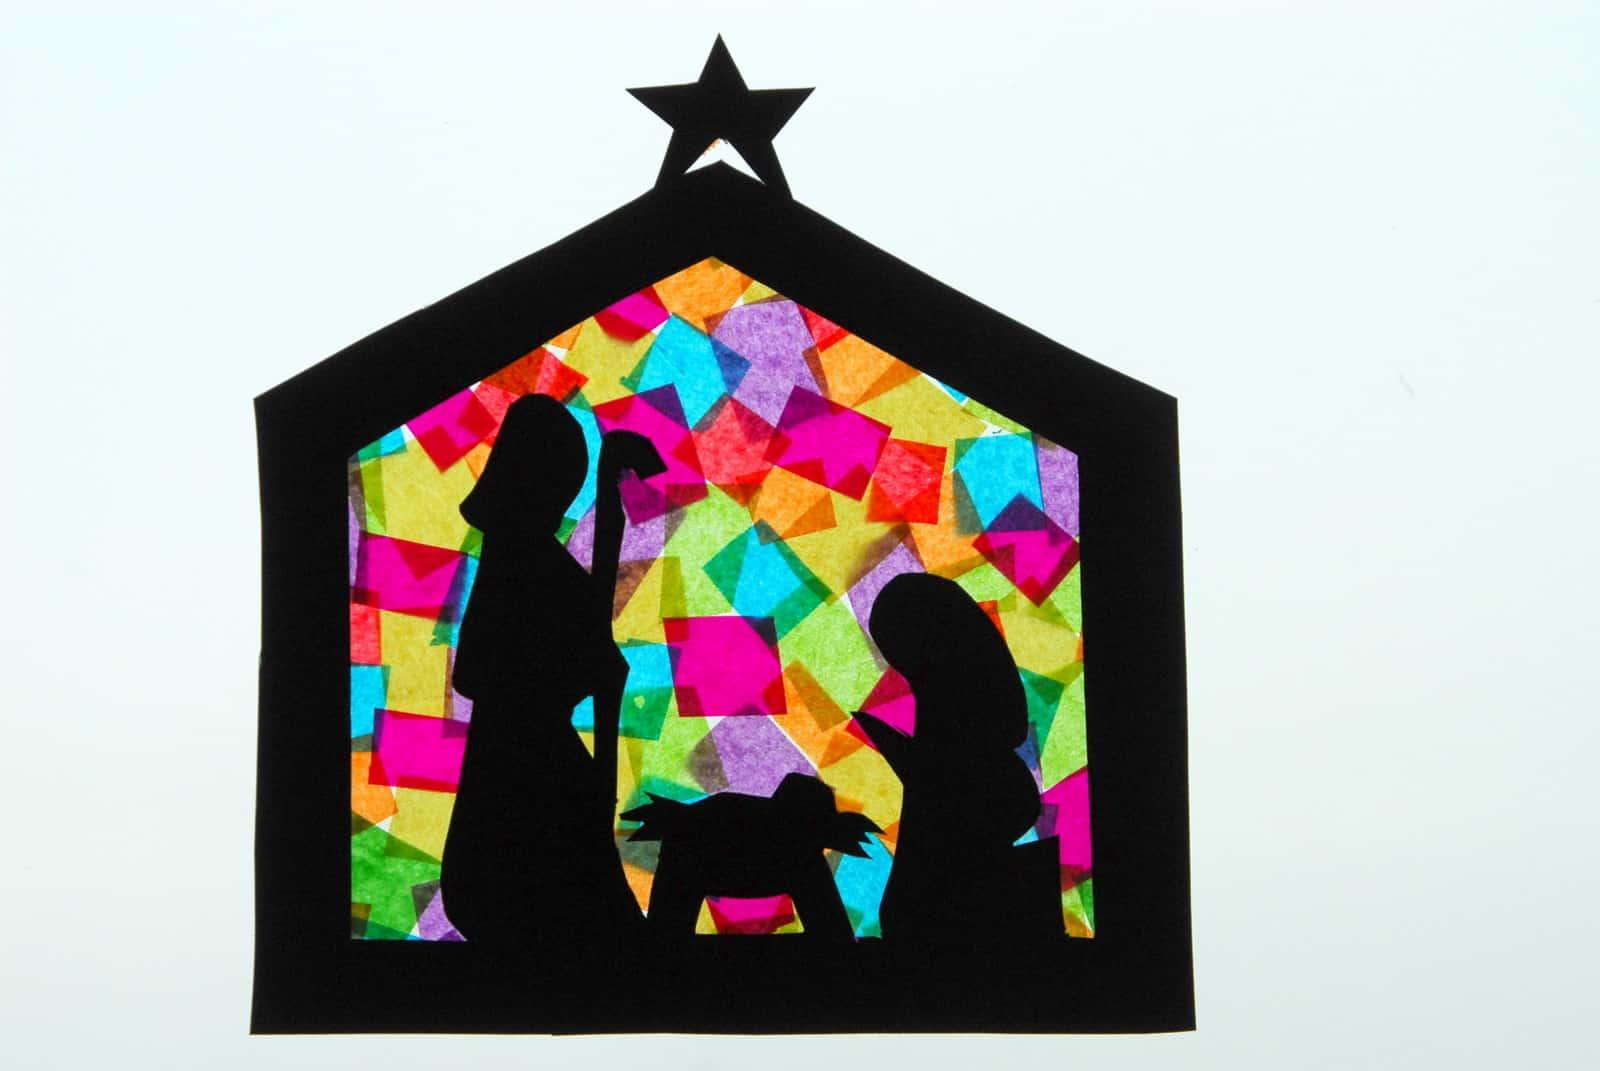 1 nativitycraft nativty stainedglass christmas craft. Black Bedroom Furniture Sets. Home Design Ideas